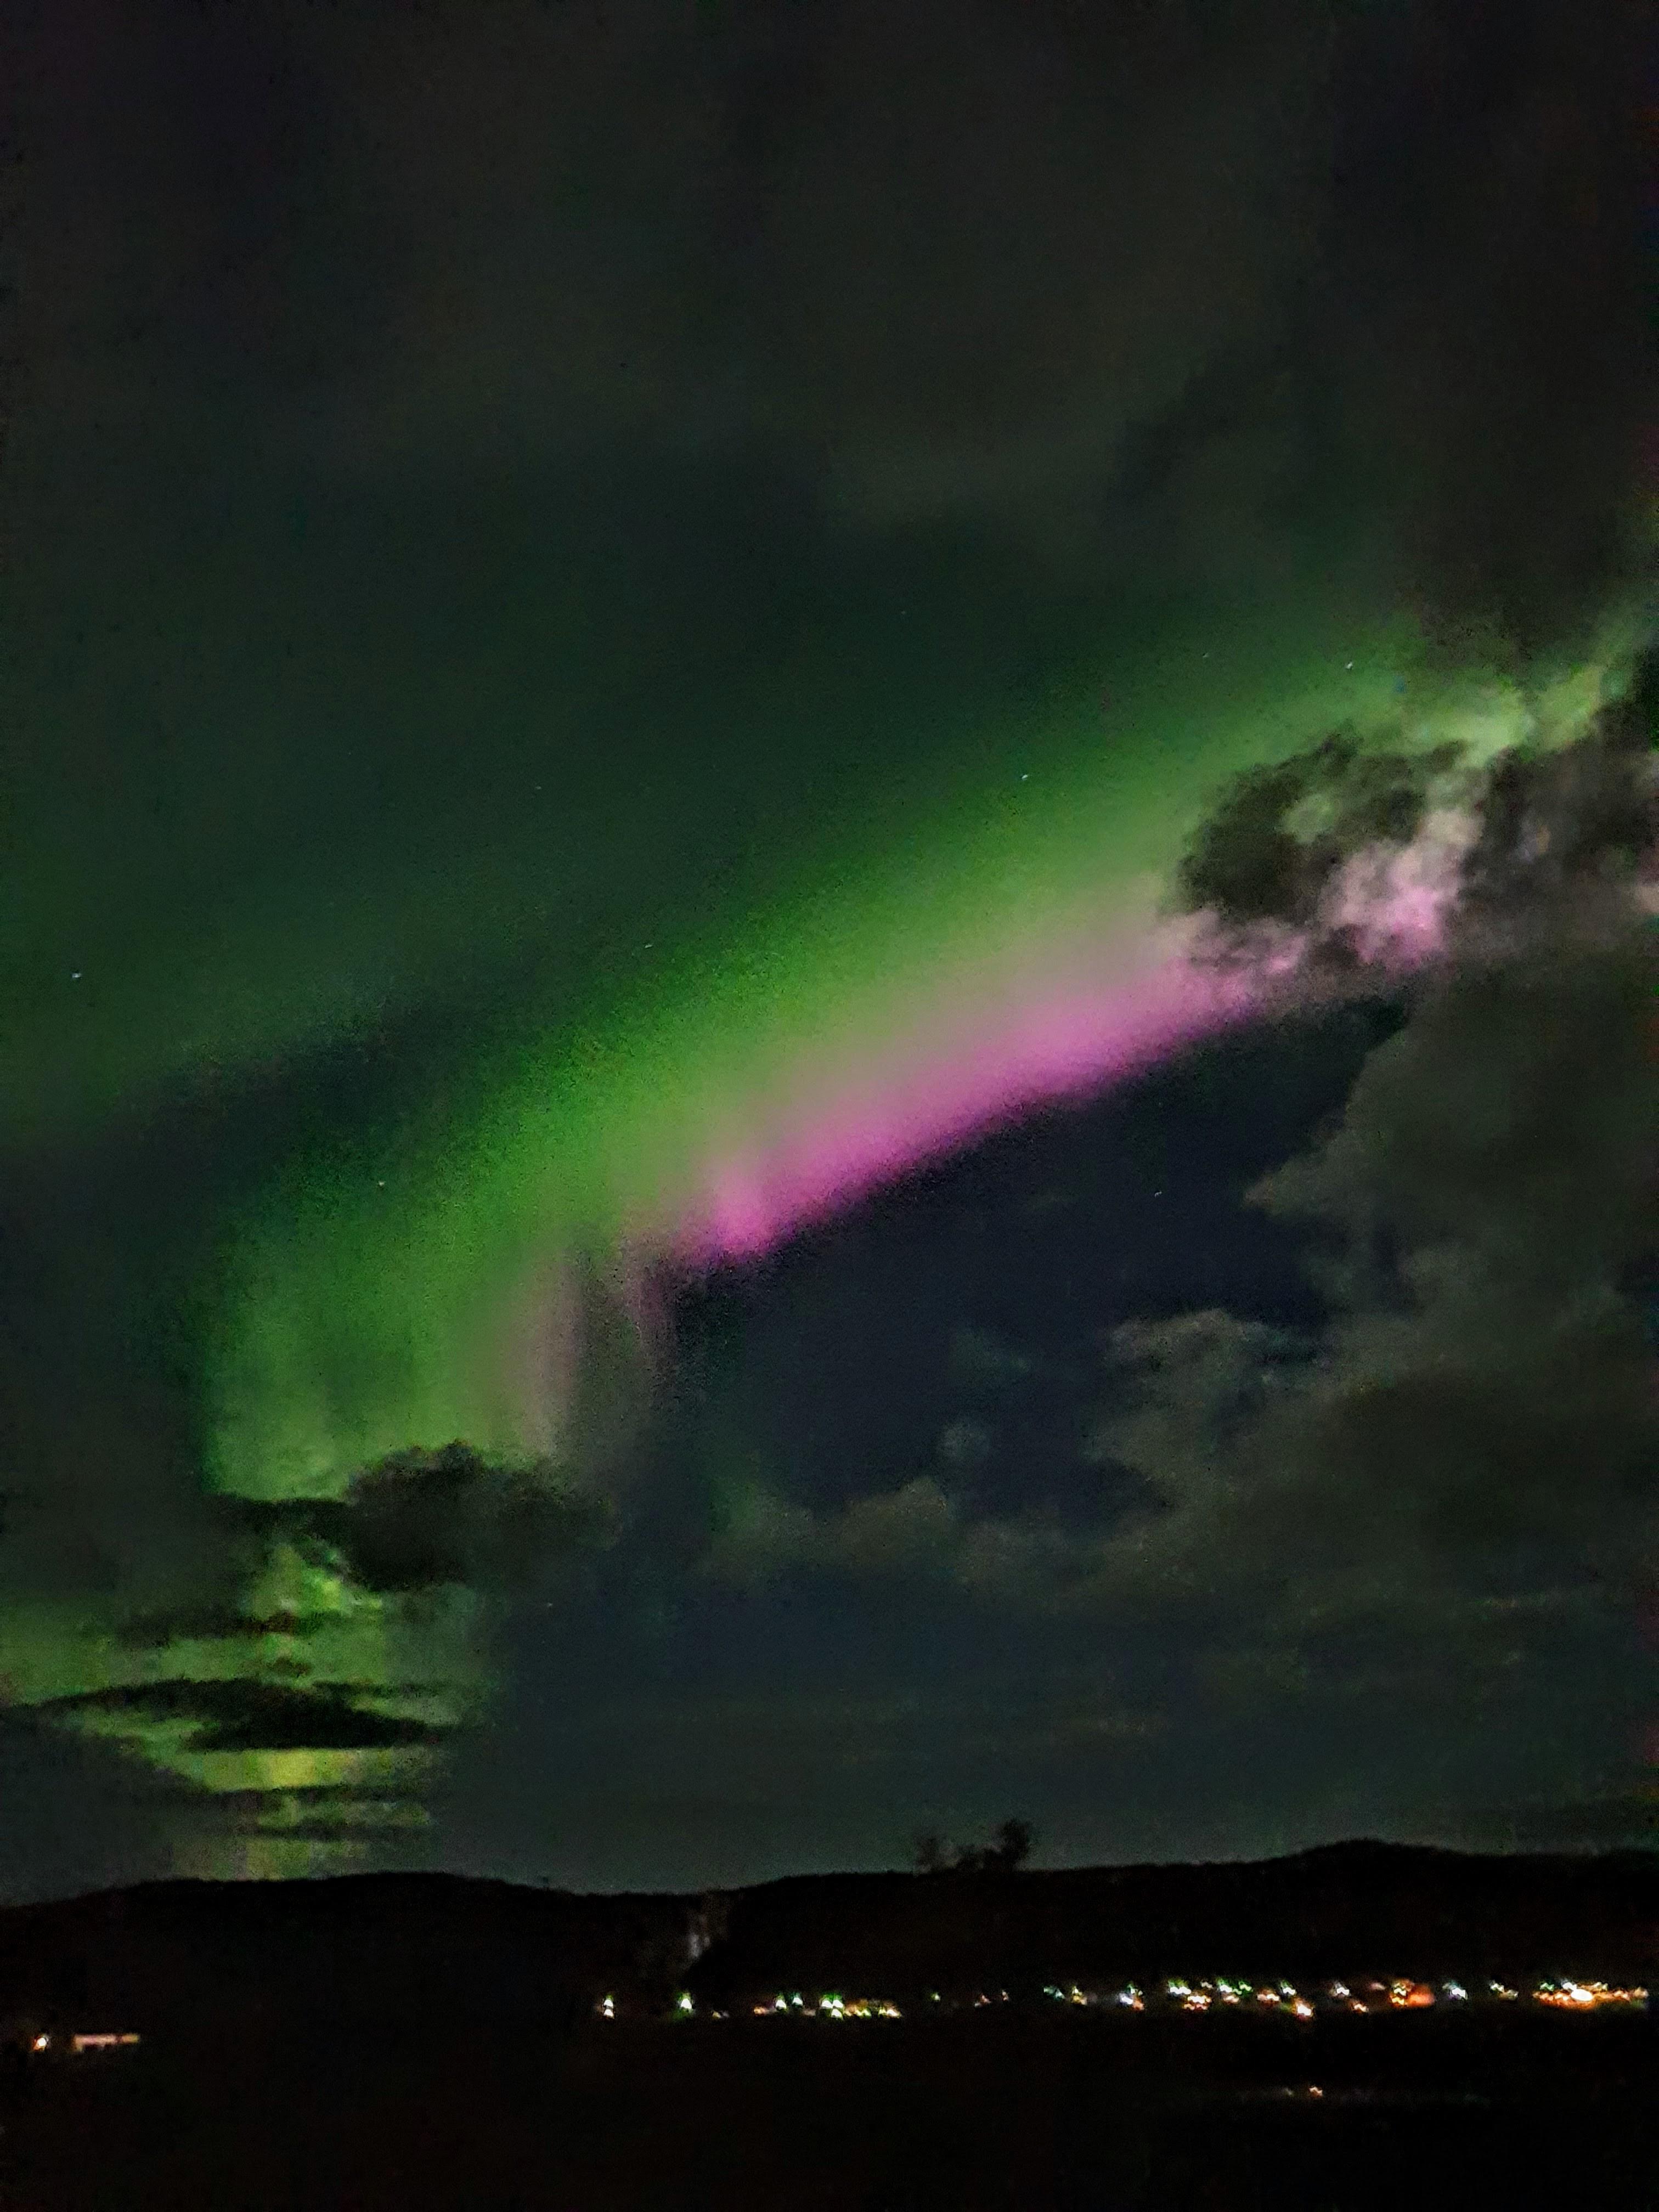 Aurora Borealis - The northern lights